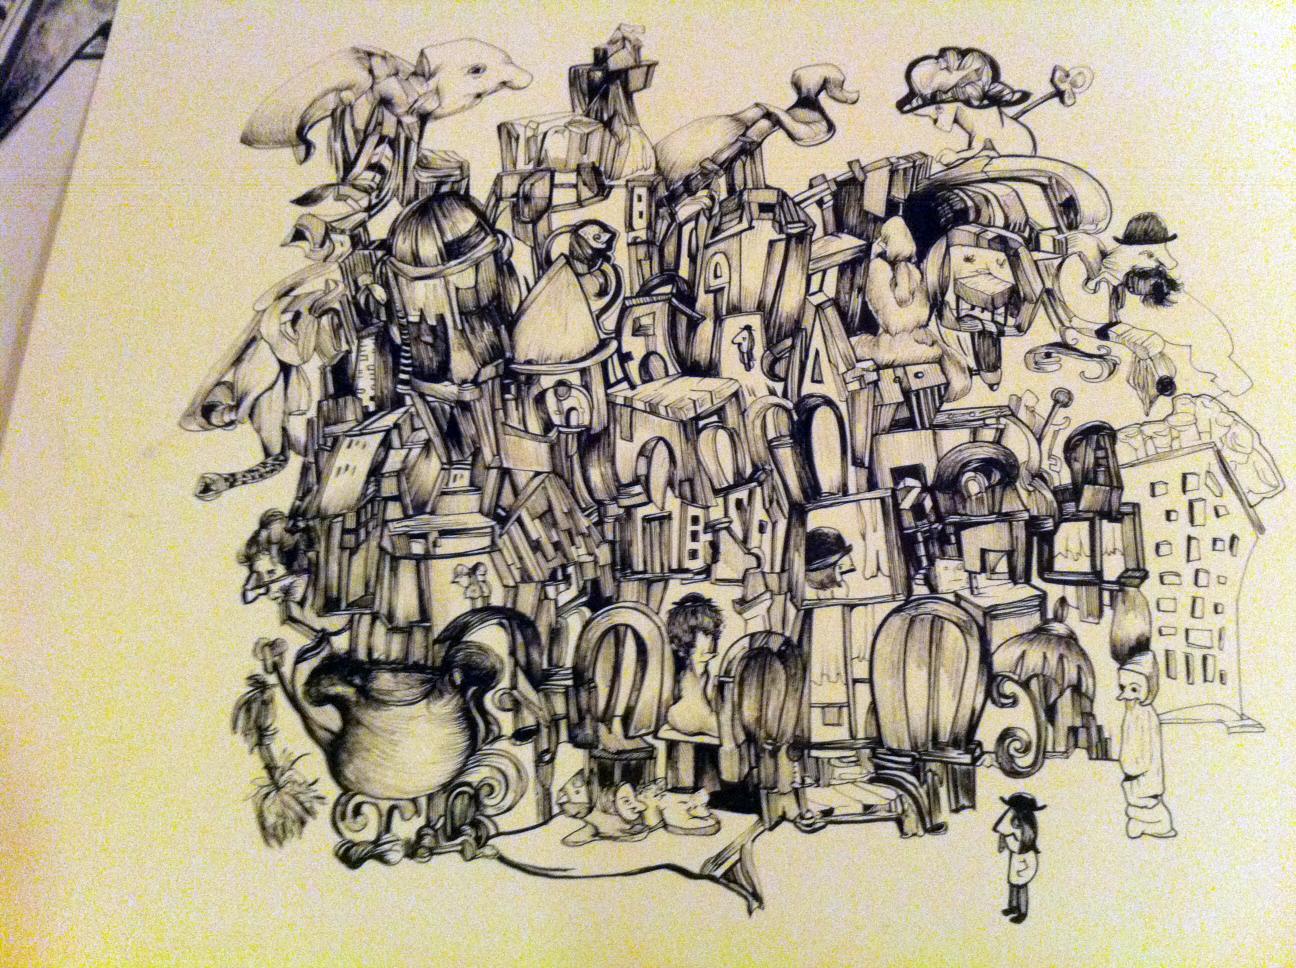 Work in Progress - Dana Jeri Maier